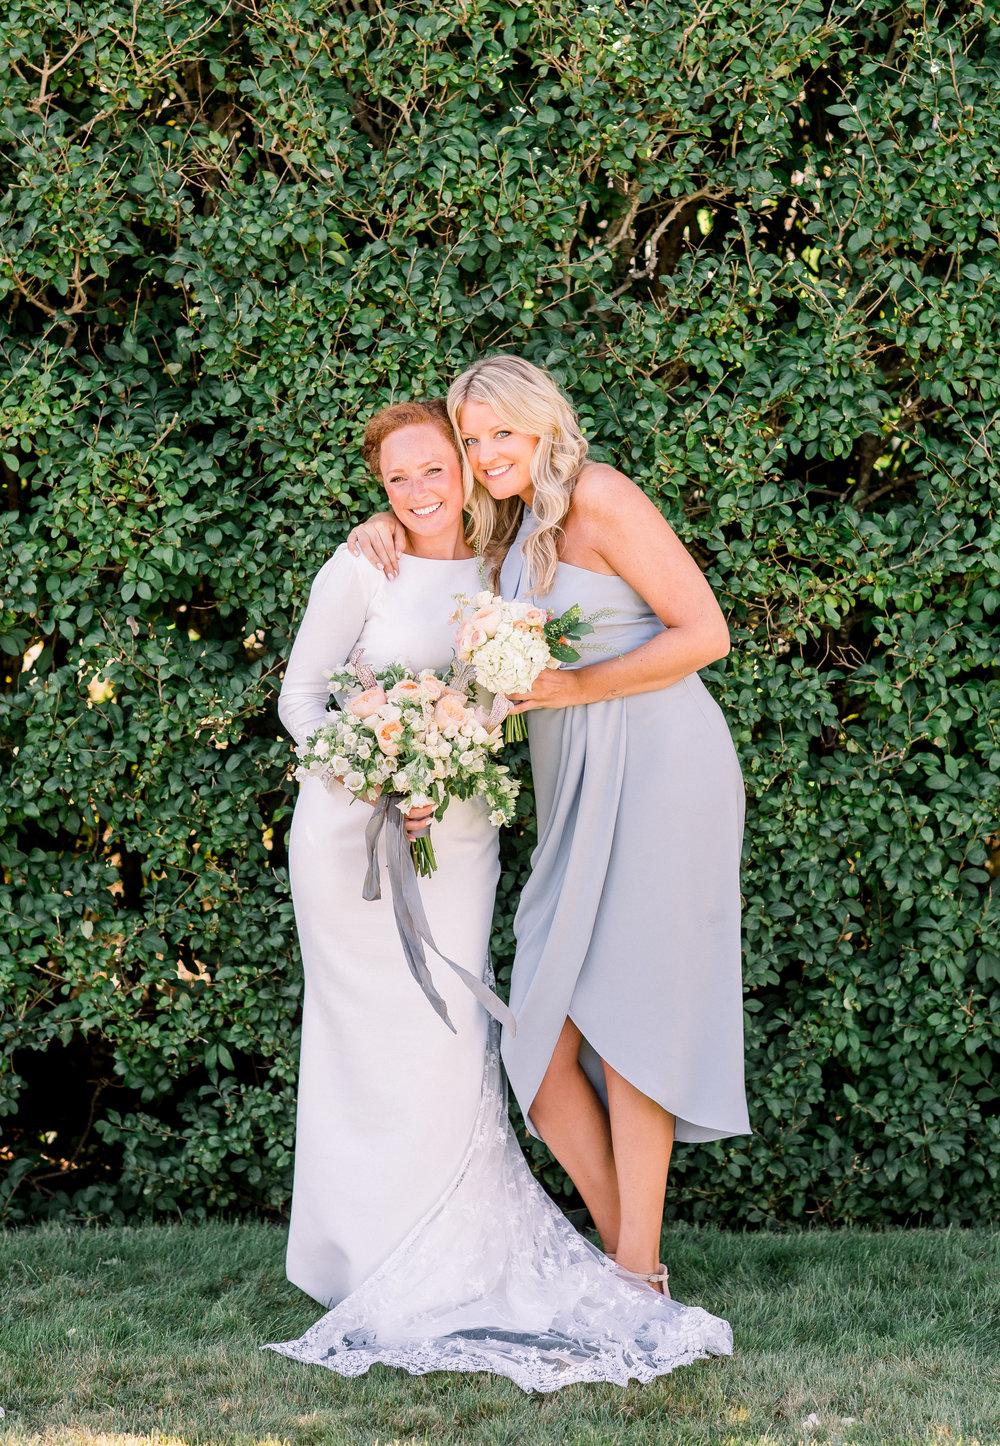 Whit & Rob's Nantucket Wedding-21.jpg